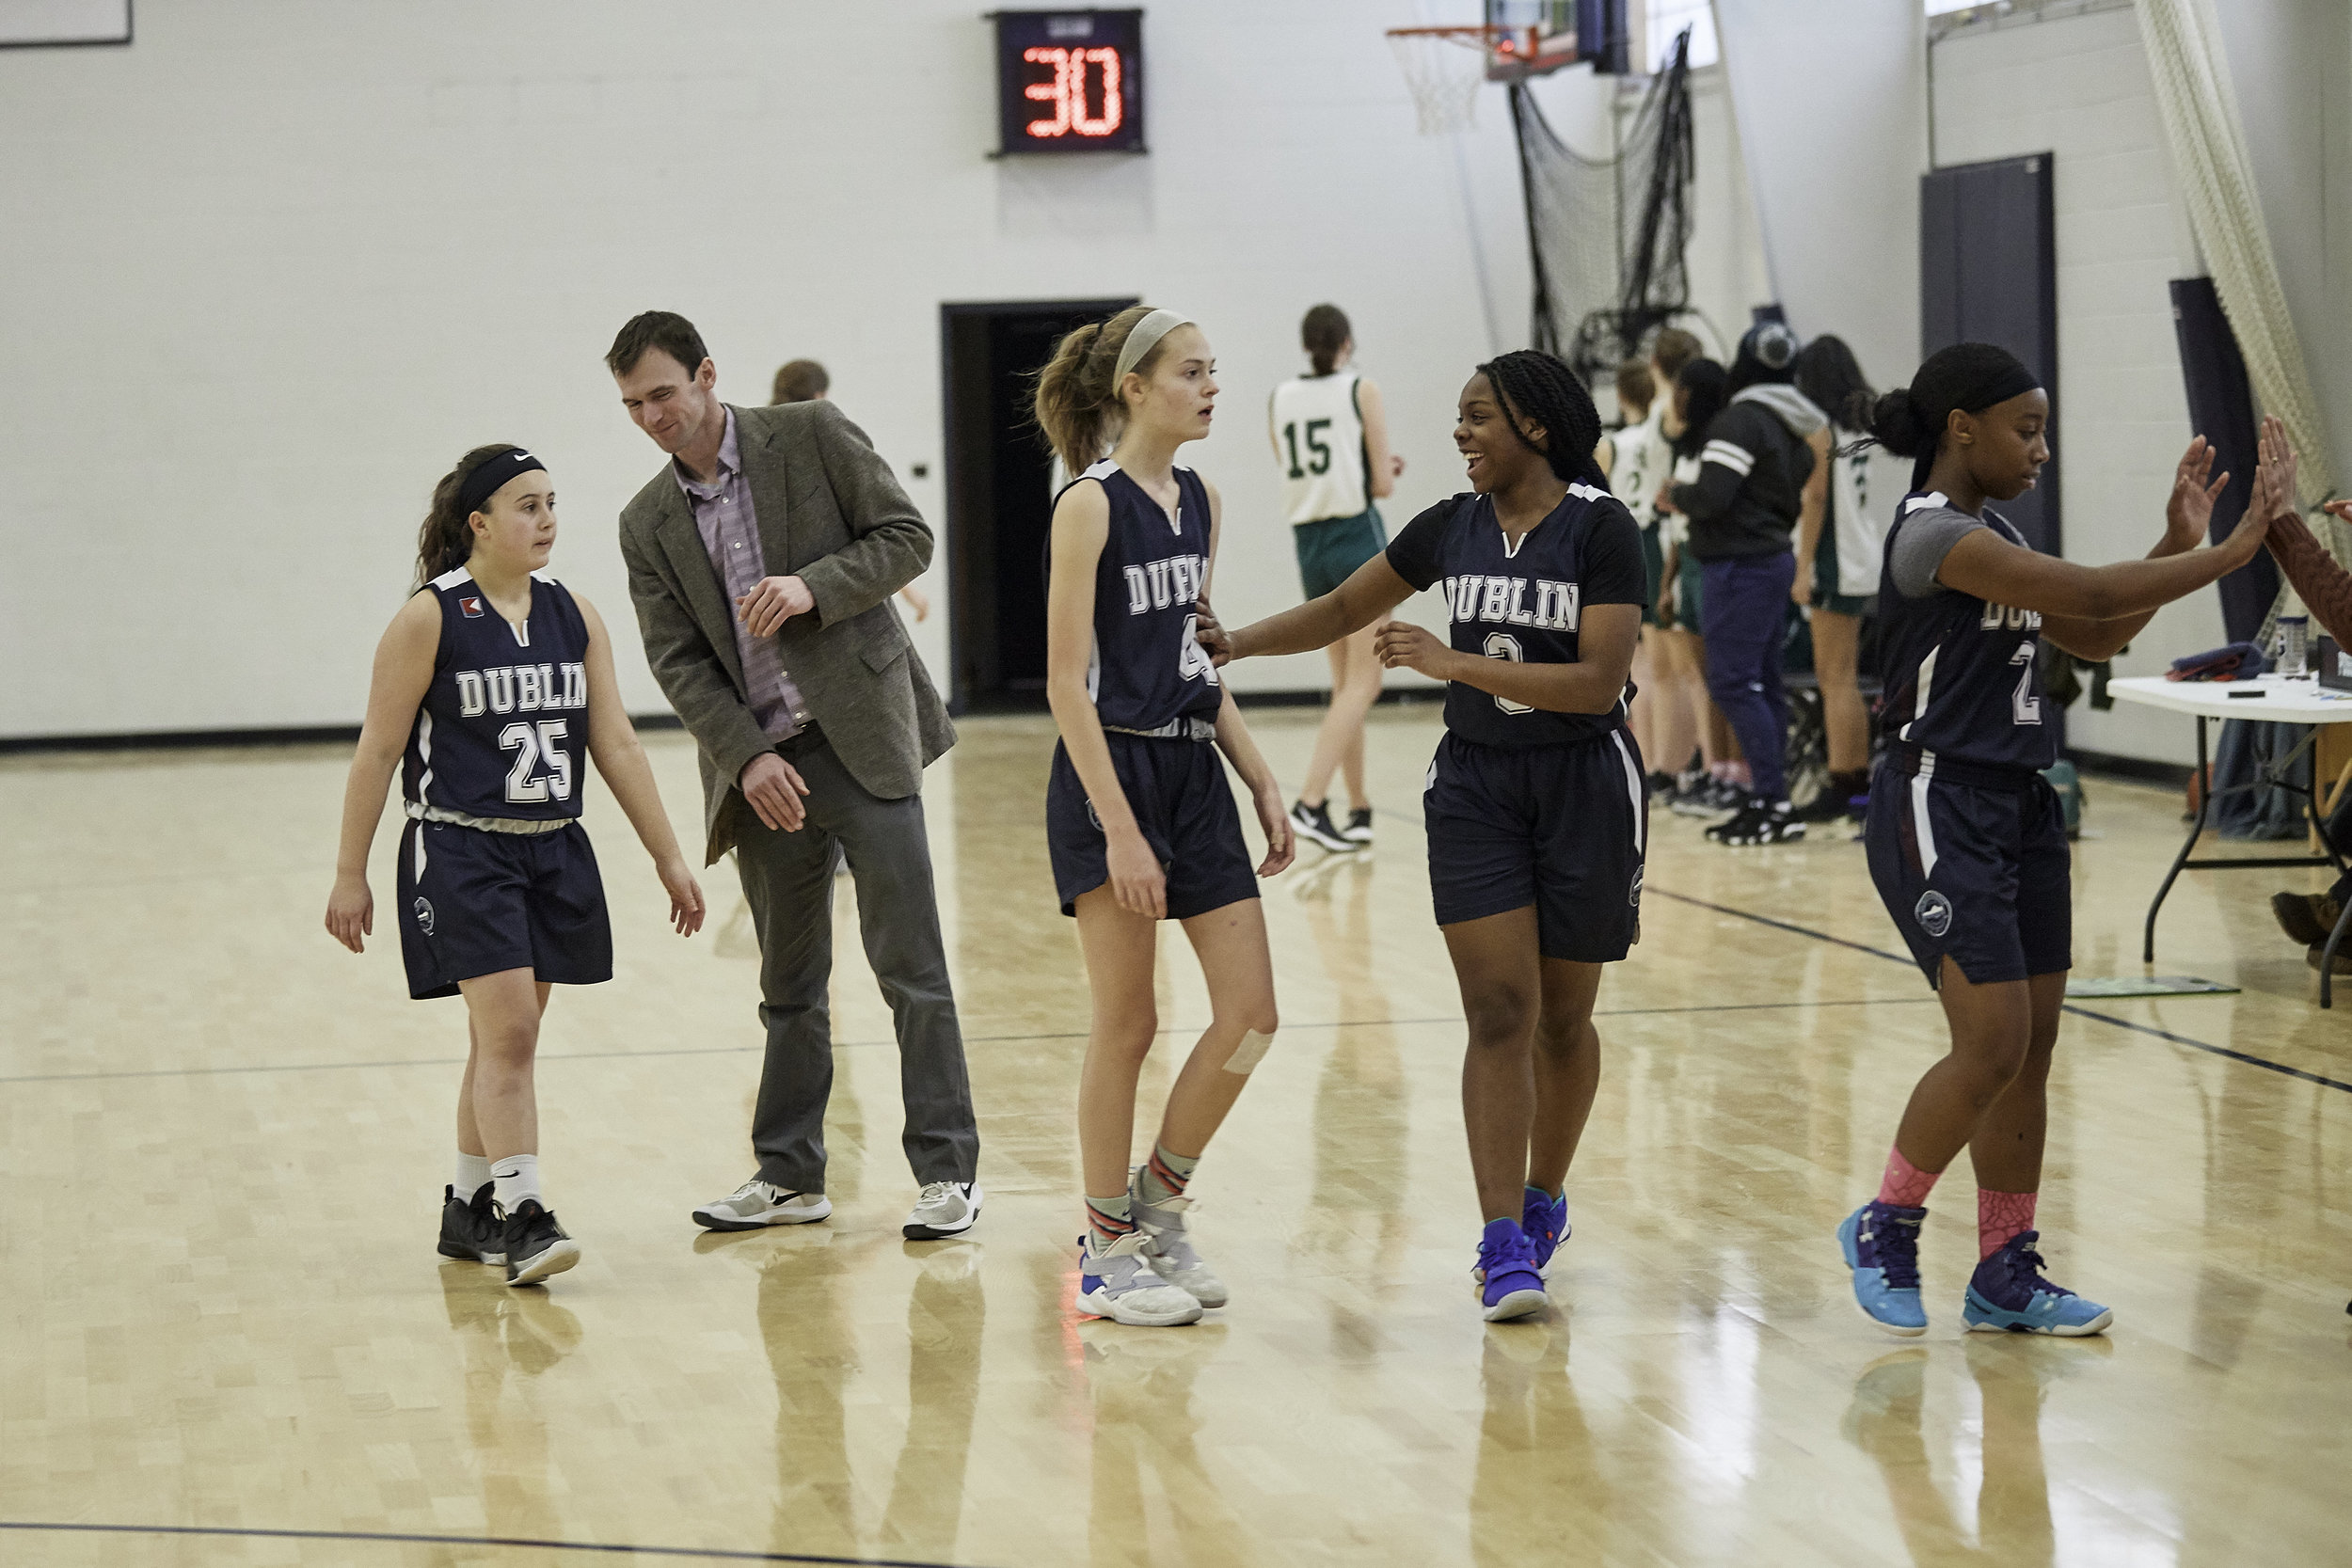 Basketball vs High Mowing School, February 2, 2019 - 166550.jpg